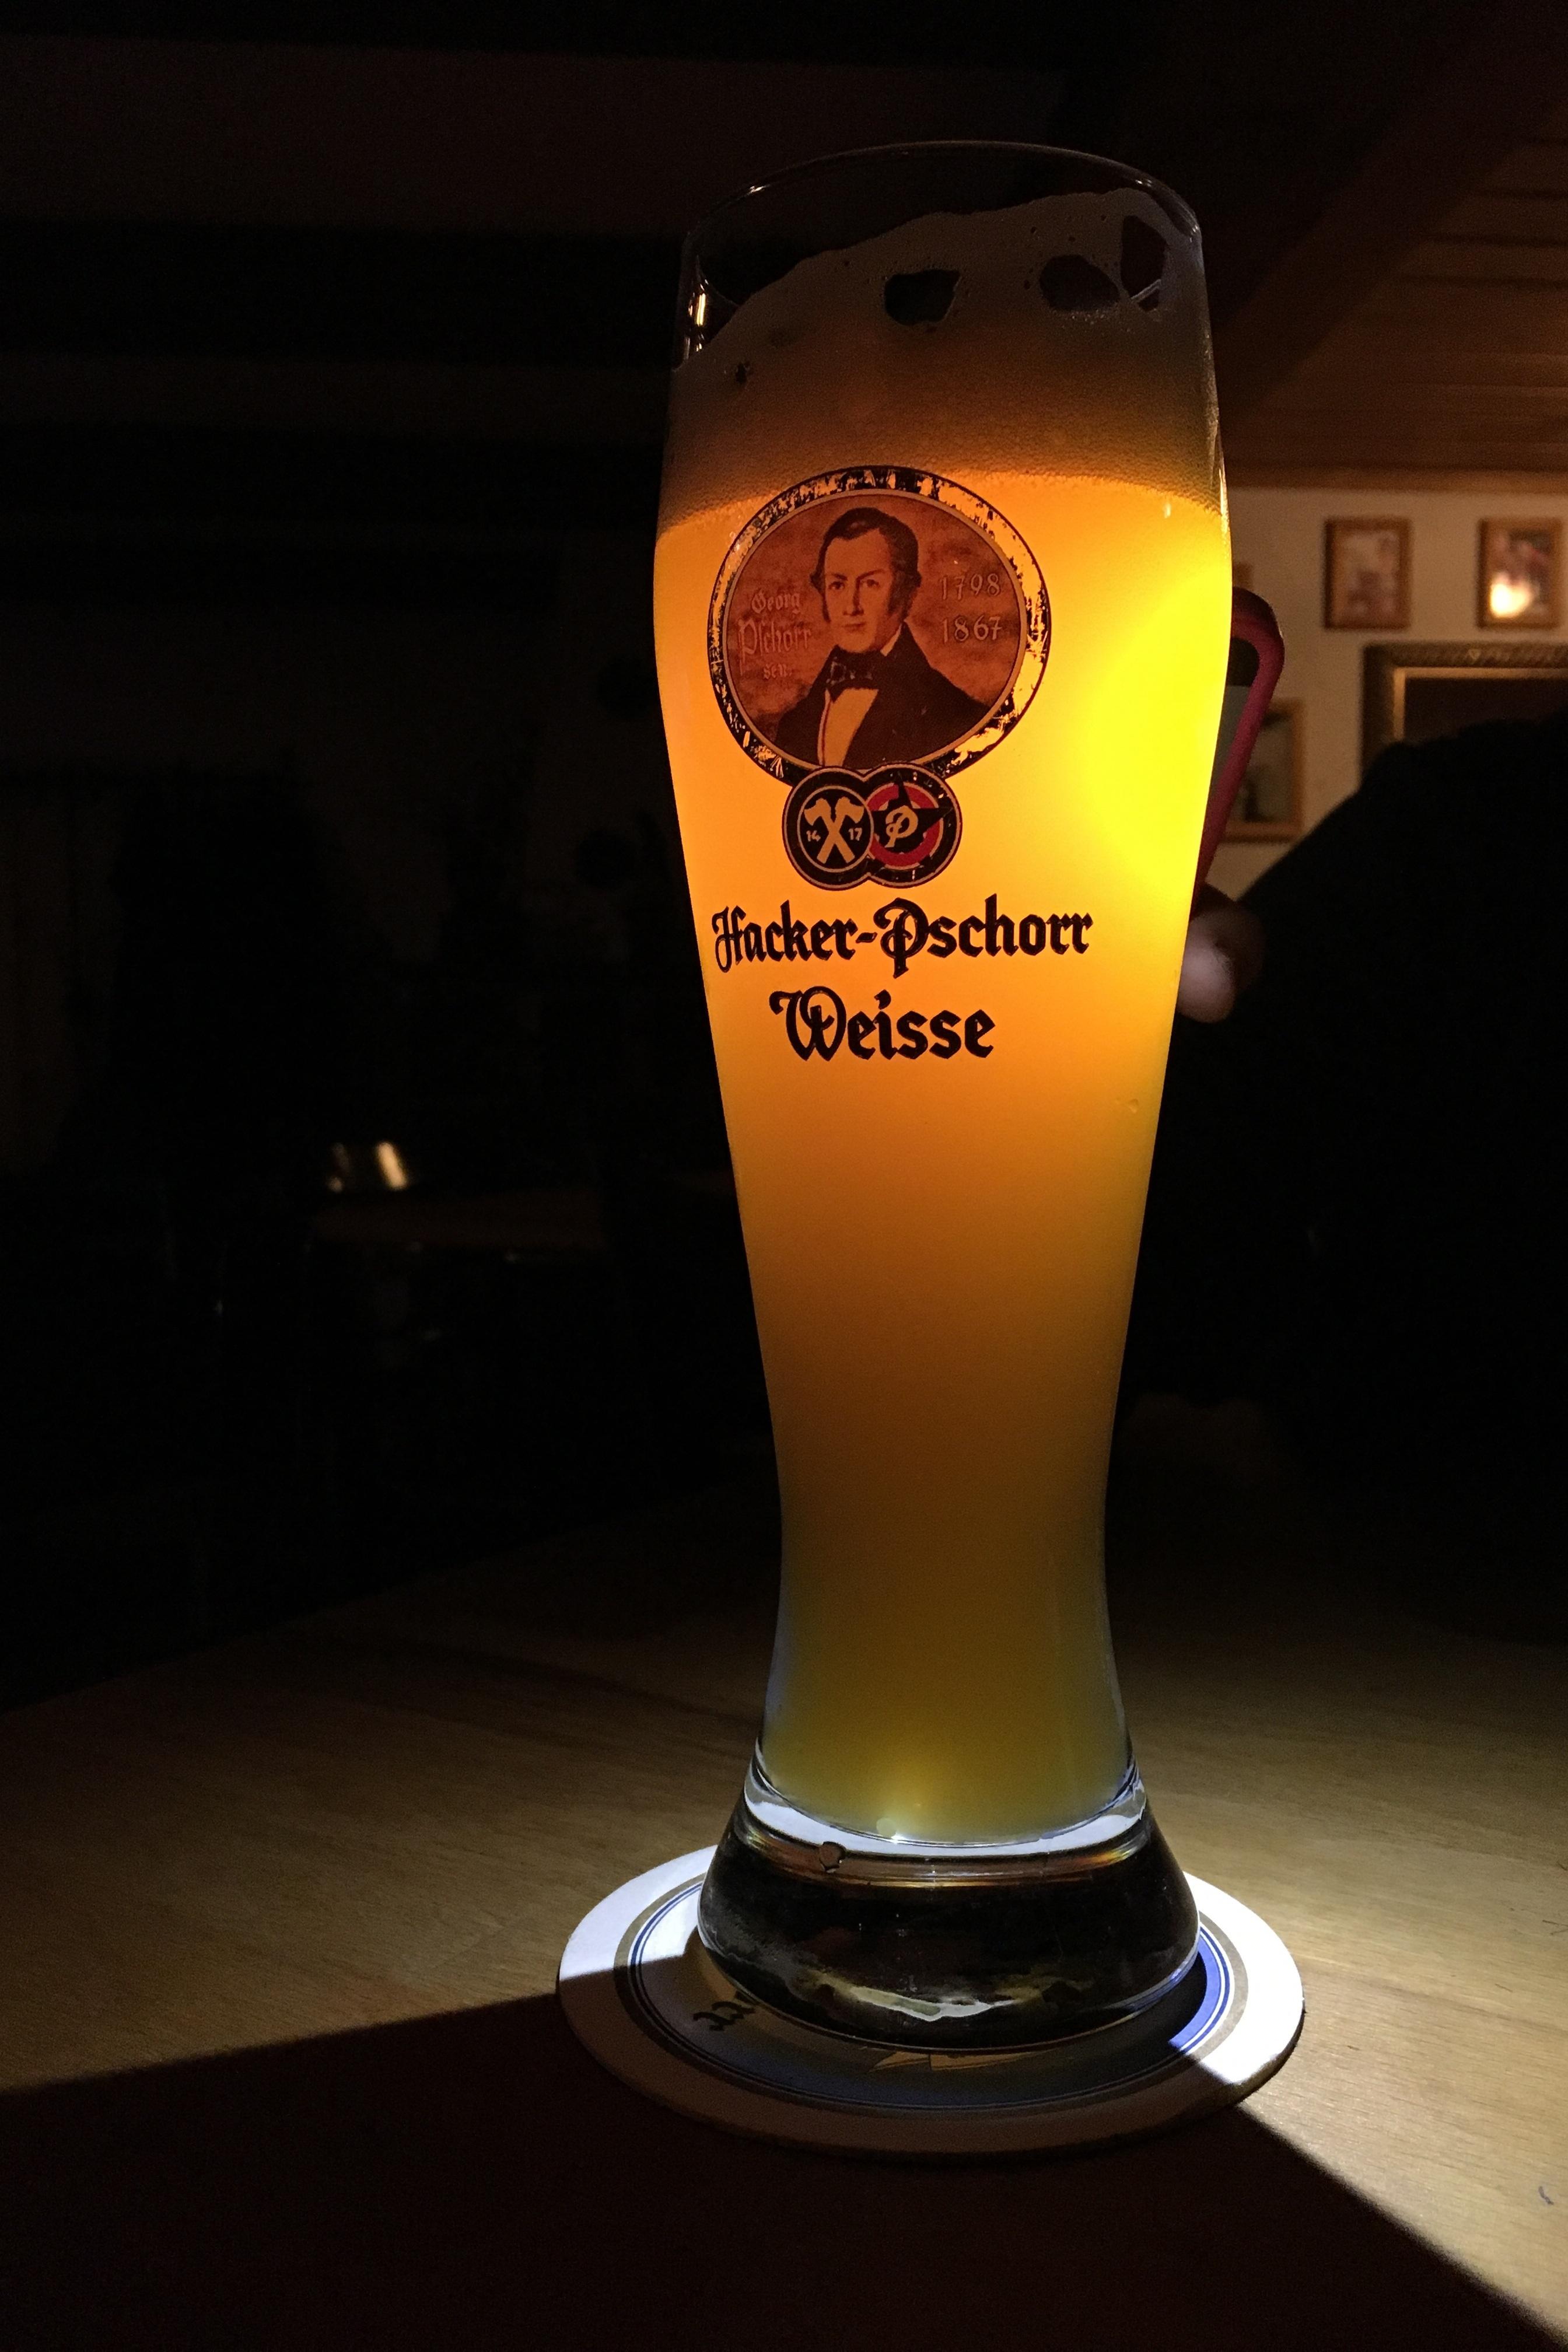 bebendo cerveja no iphone